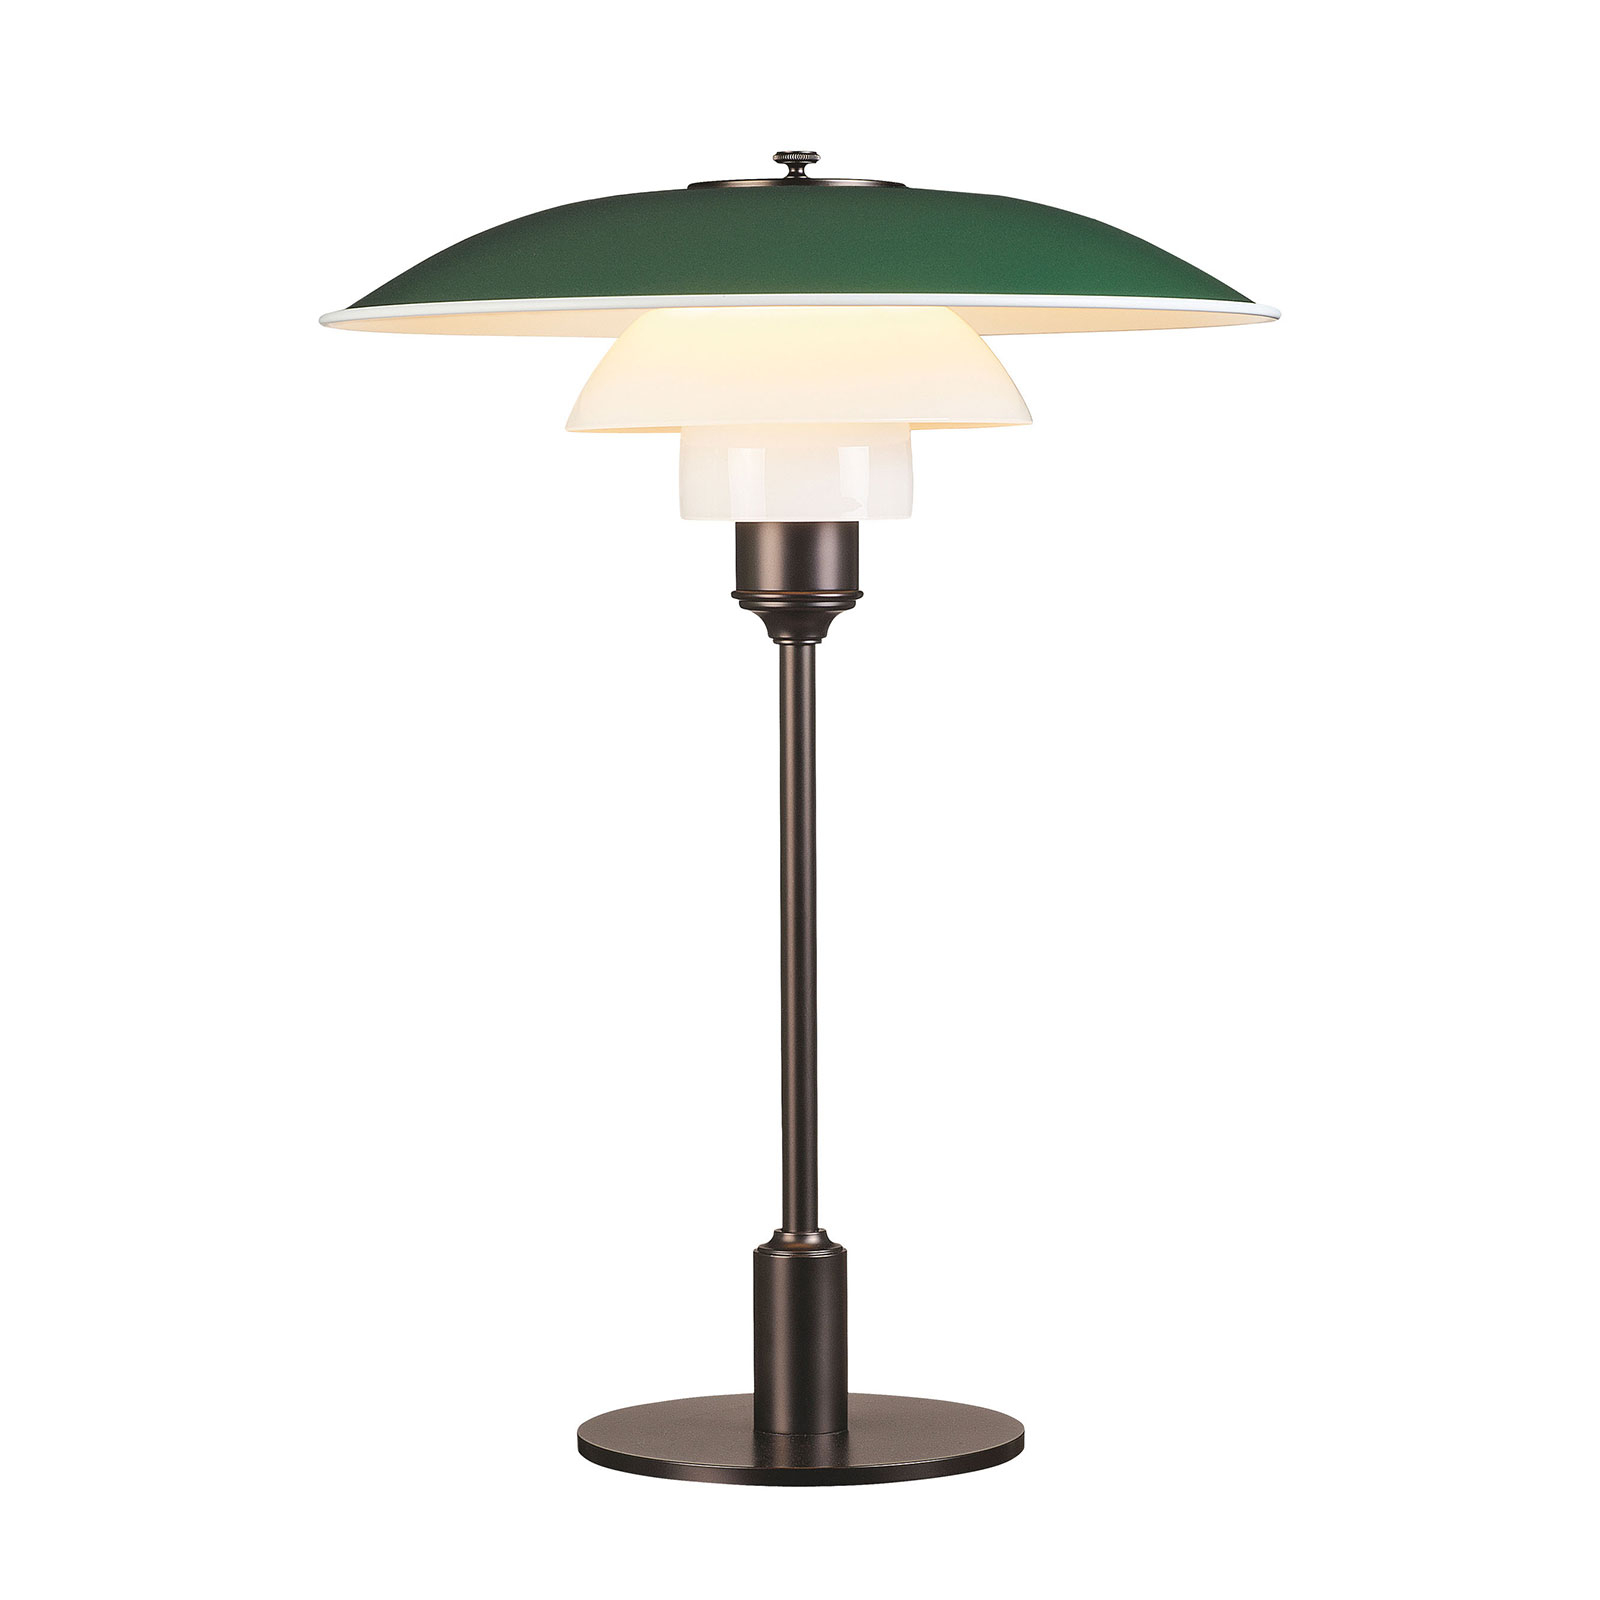 Louis Poulsen PH 3 1/2-2 1/2 tafellamp bruin/groen